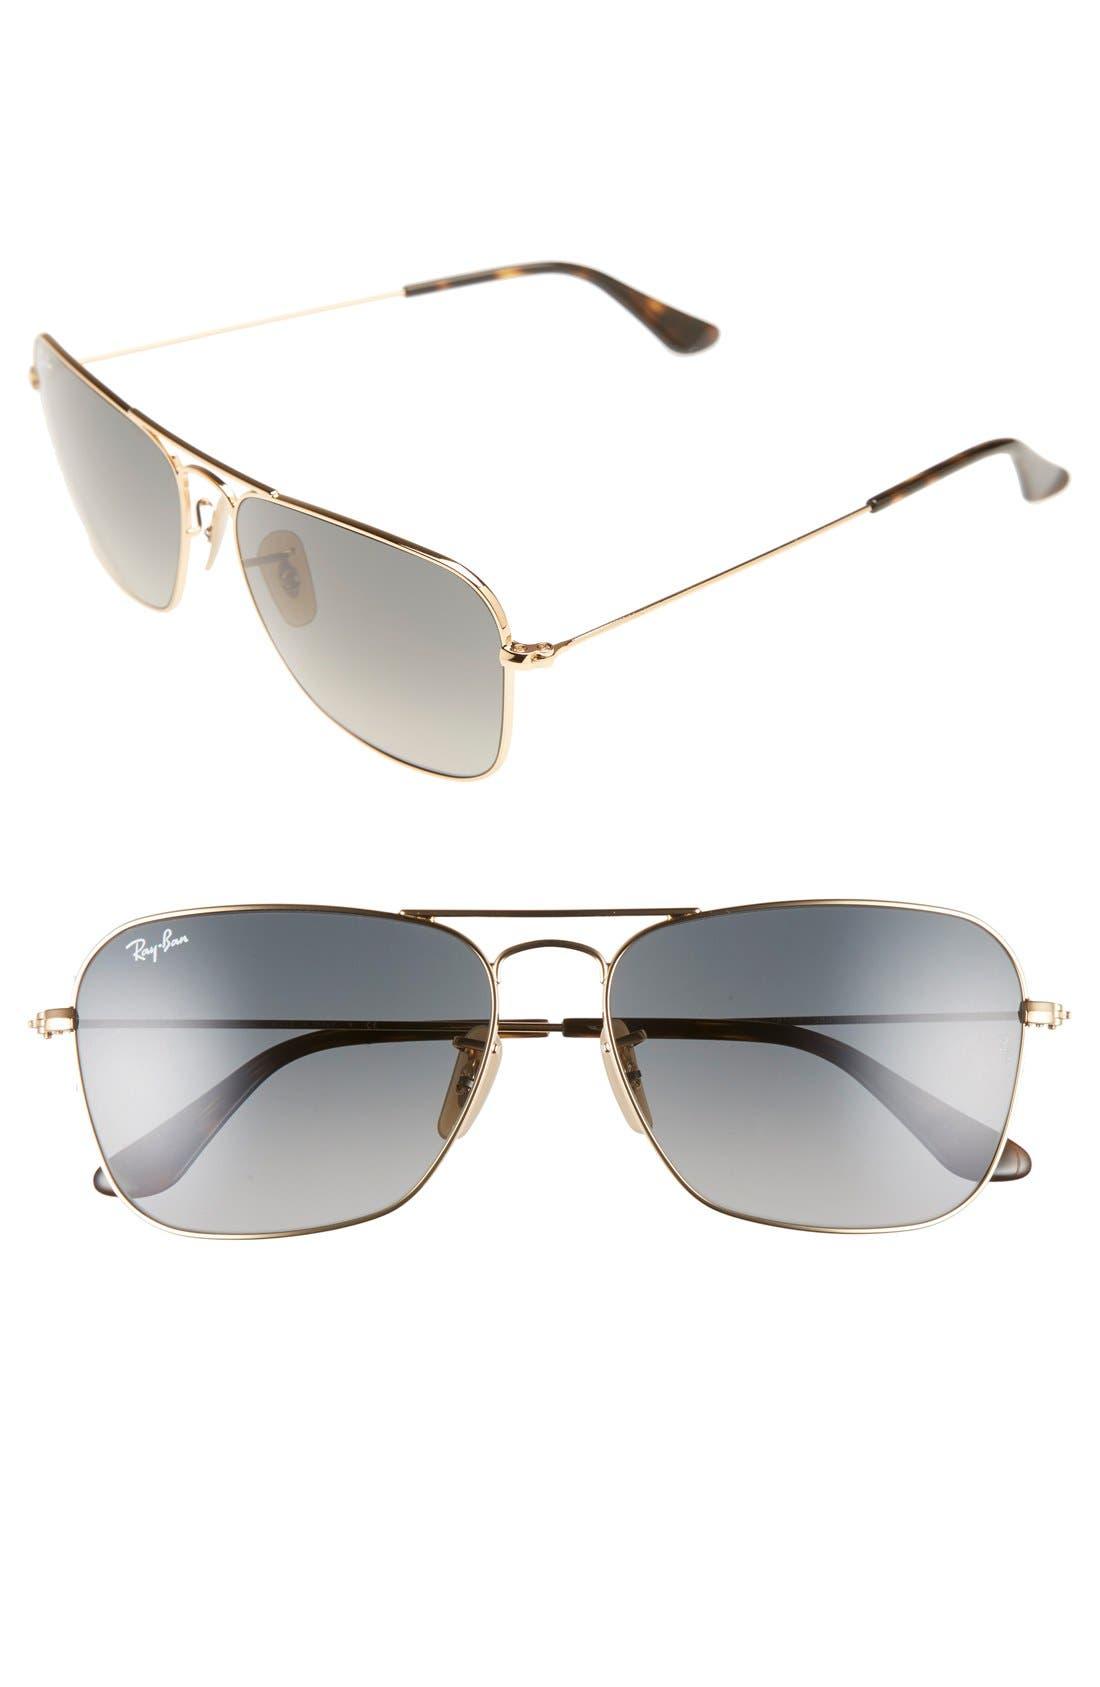 Main Image - Ray-Ban Caravan 58mm Aviator Sunglasses